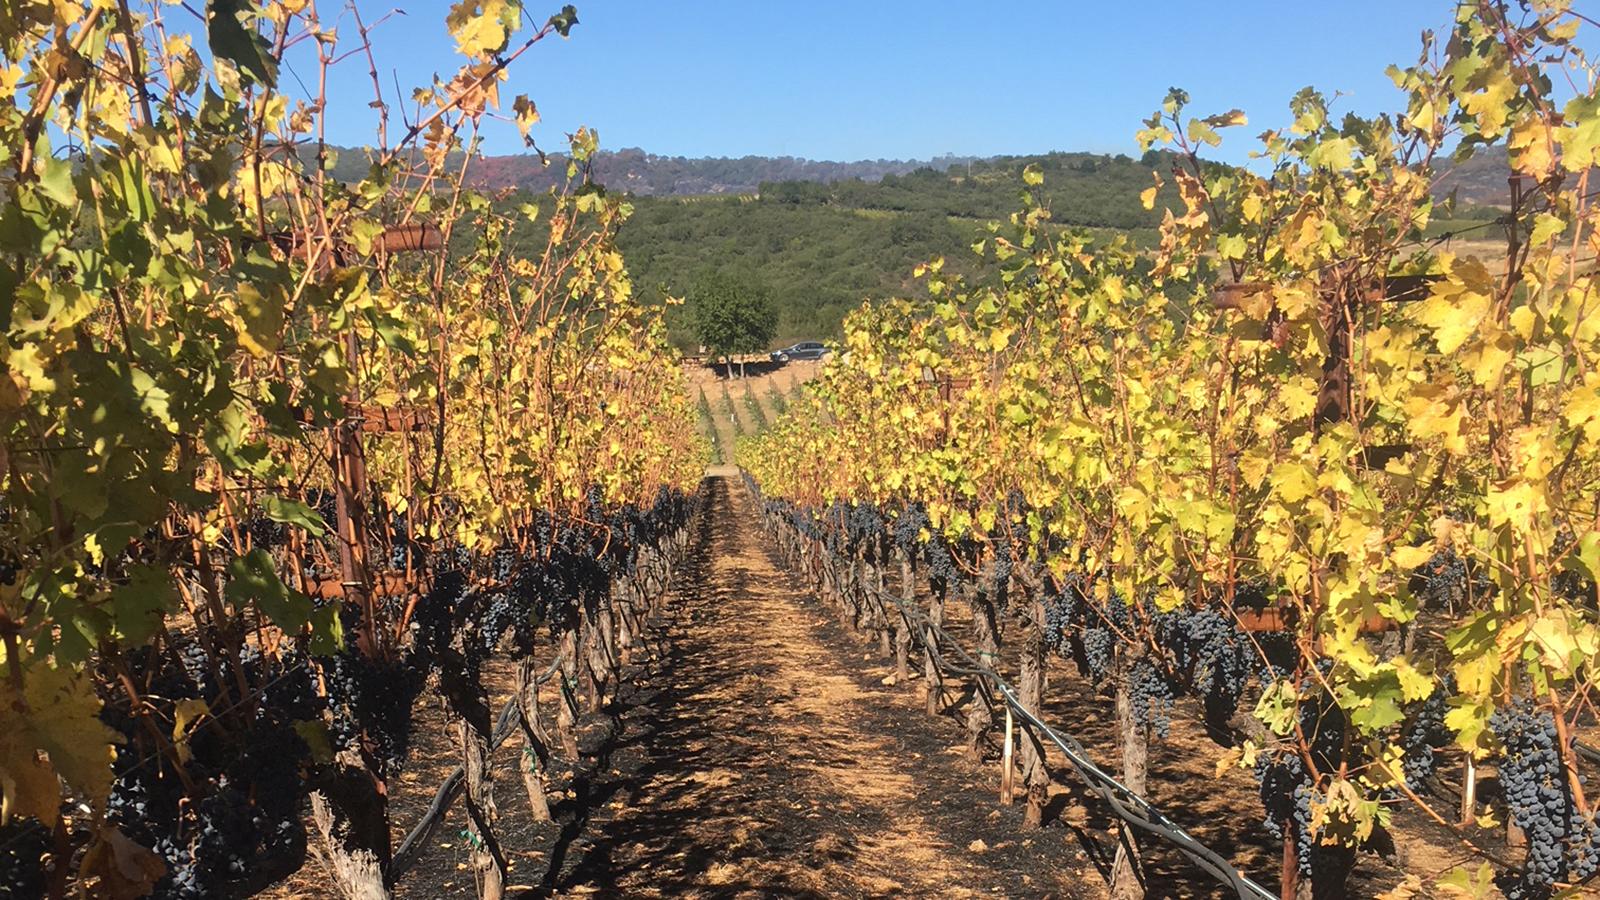 Photo by: Courtesy Michael Mondavi Family Estate  Scorched ground and shriveled grapes were left behind at Michael Mondavi's Atlas Peak vineyard. Photo taken from Wine Spectator